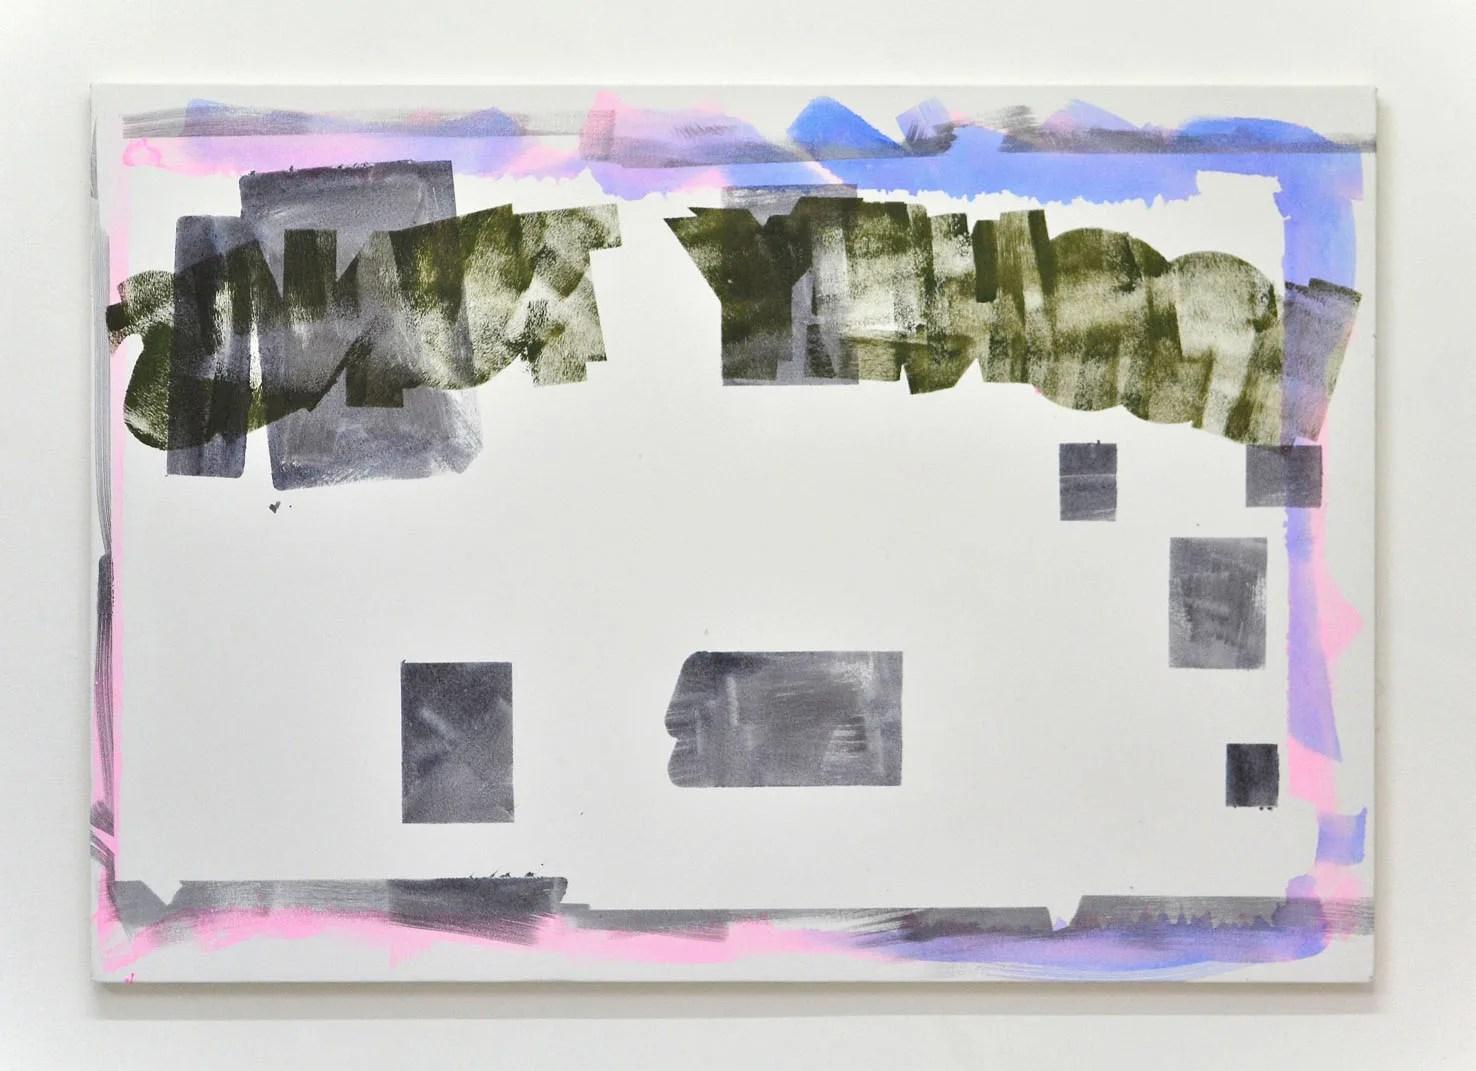 Standard, 2014 – Daniel Pettitt